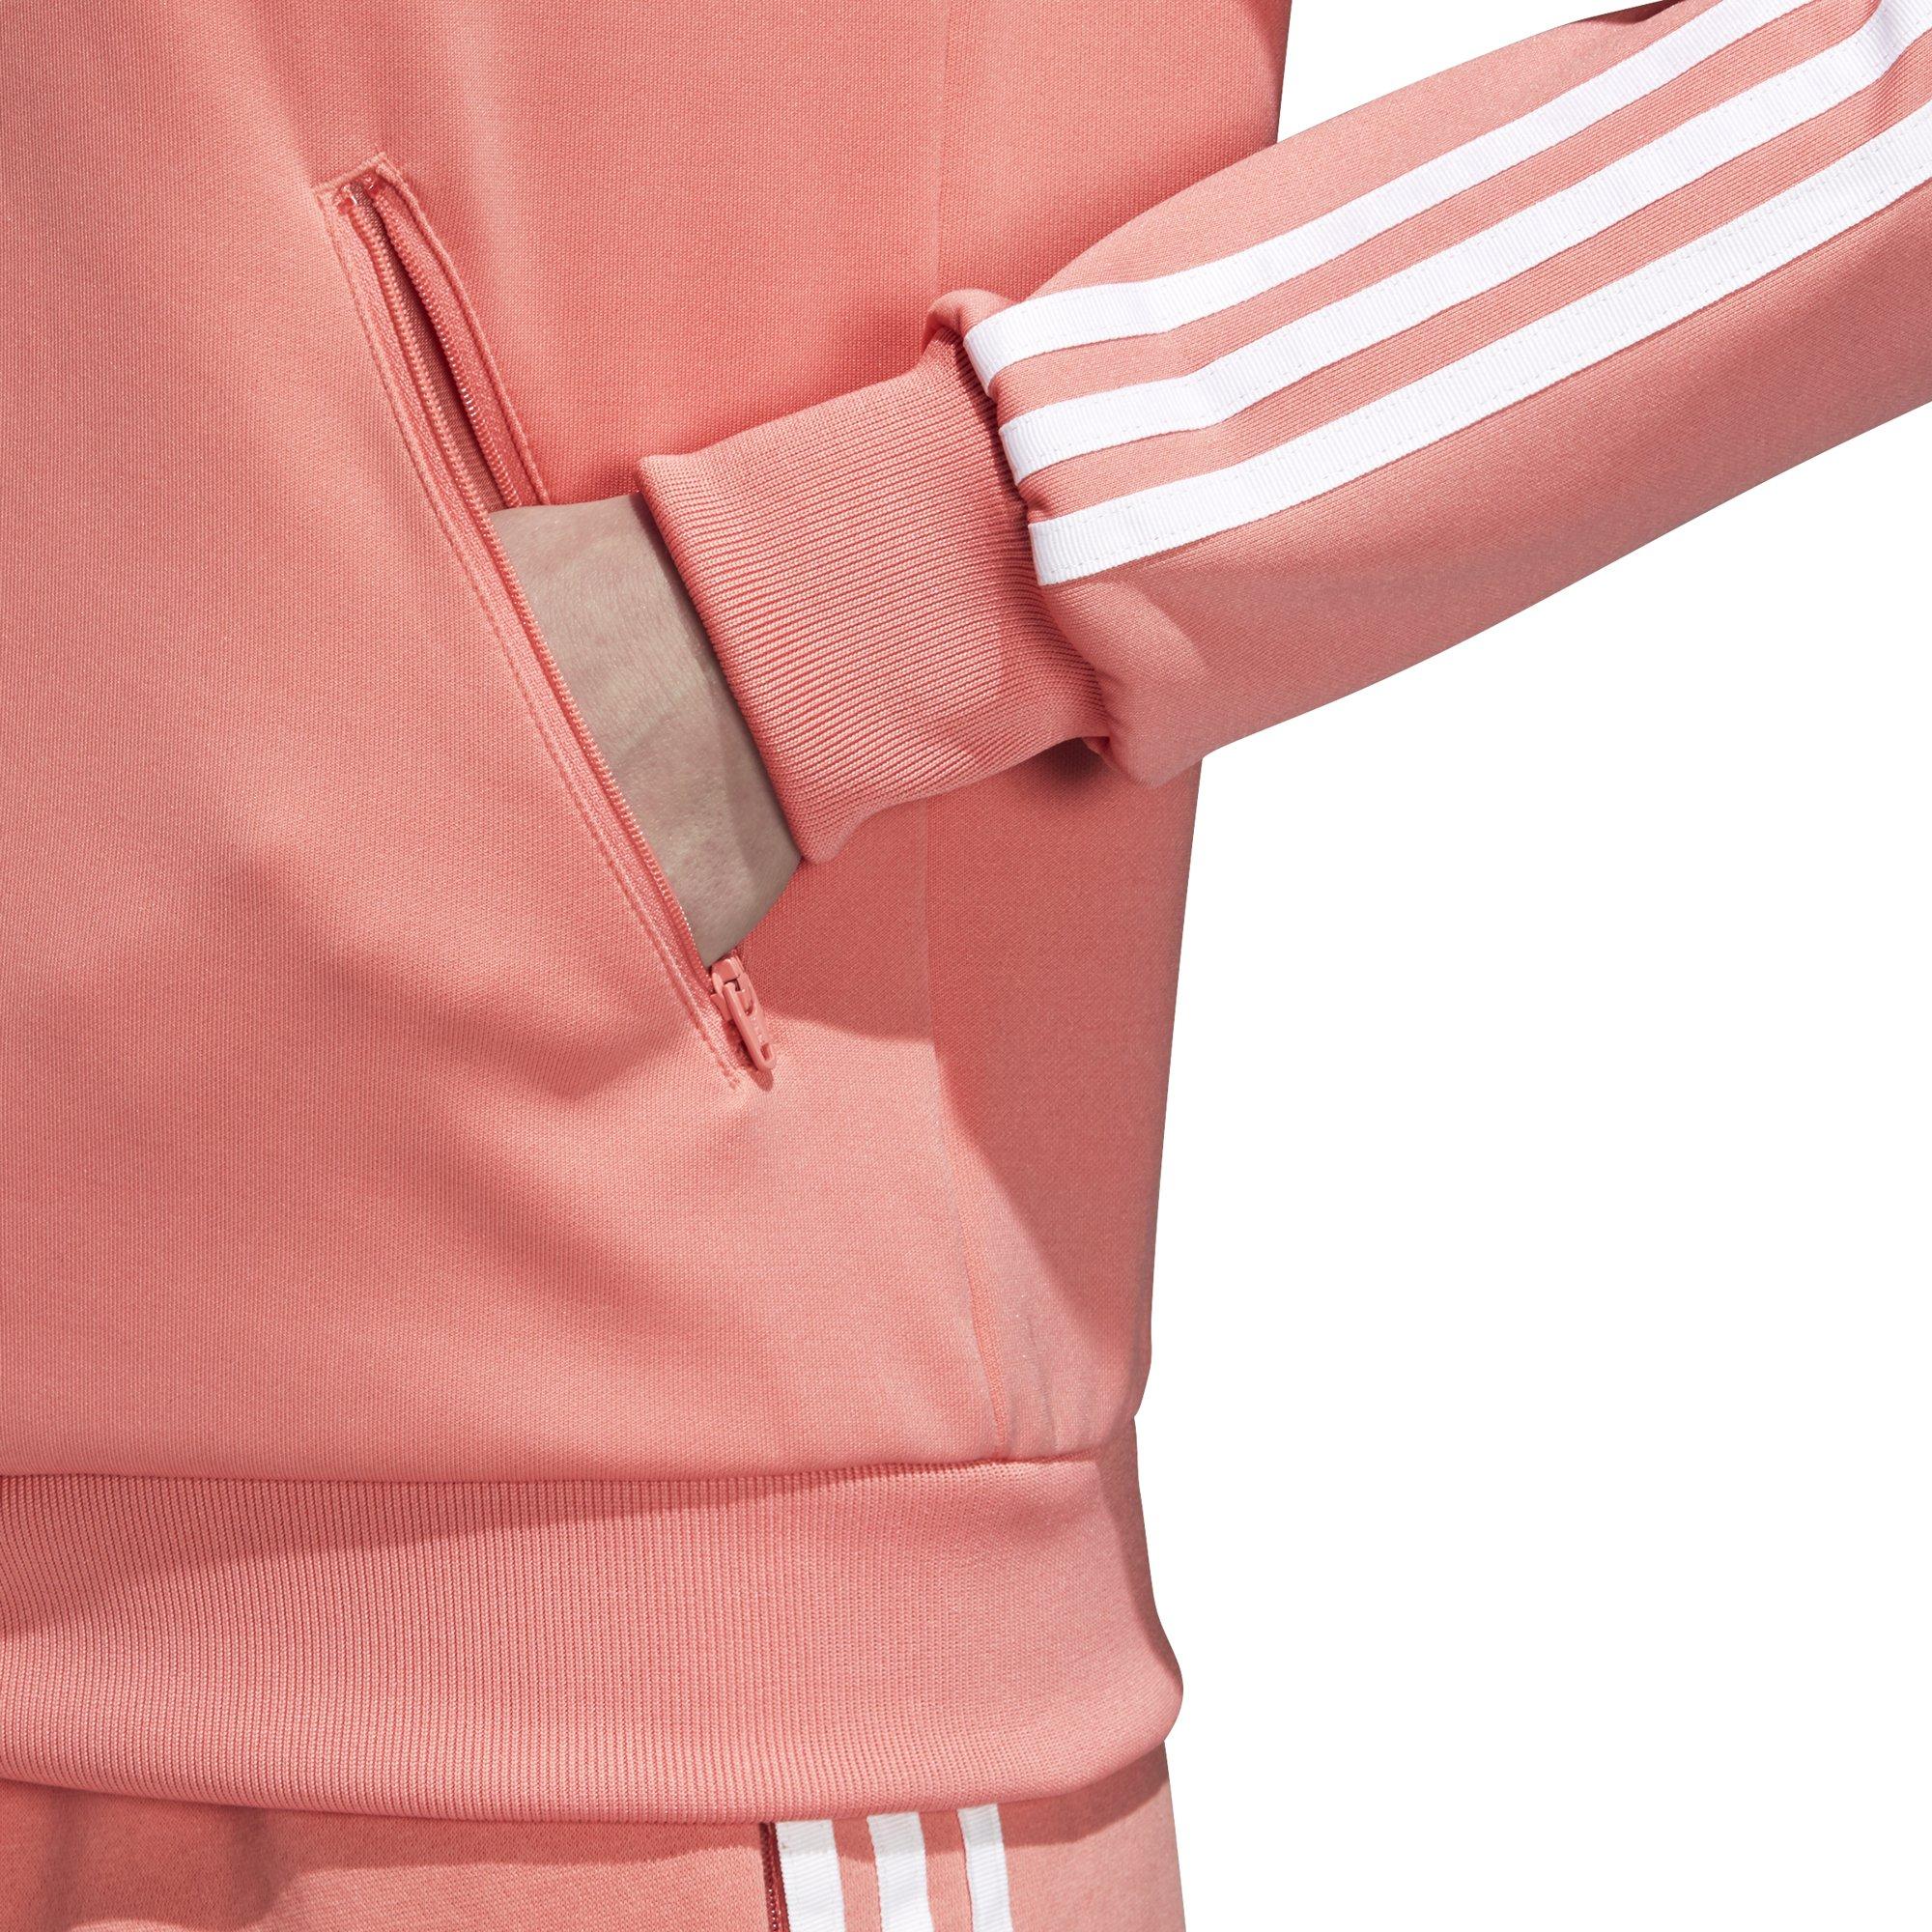 adidas Originals Women's Superstar Tracktop, Tactile Rose, L by adidas Originals (Image #6)